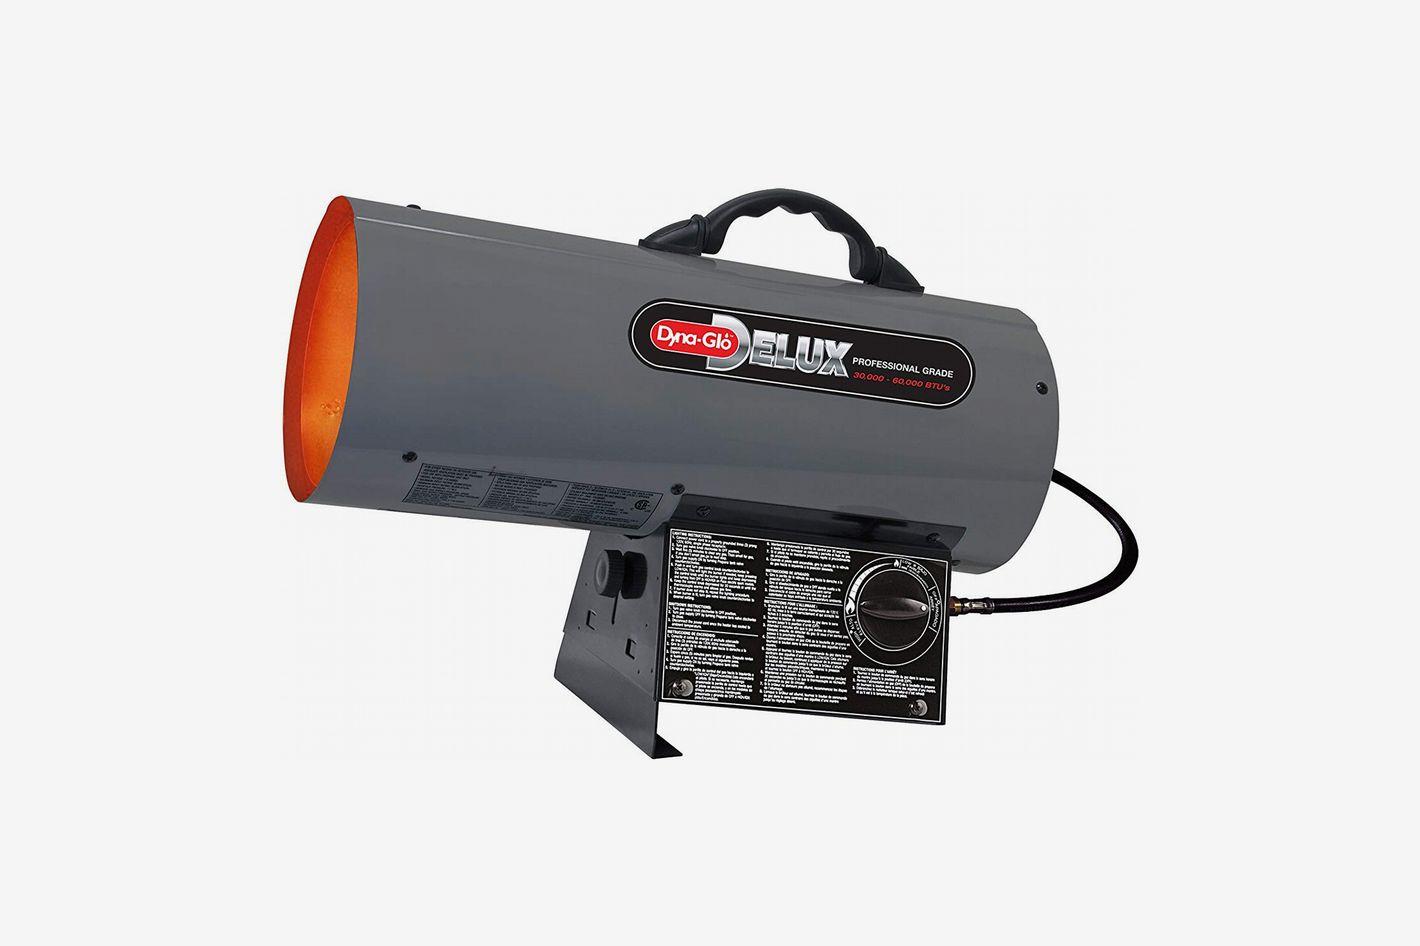 Dyna-Glo 30,000-60,000 BTU Liquid Propane Forced Air Heater